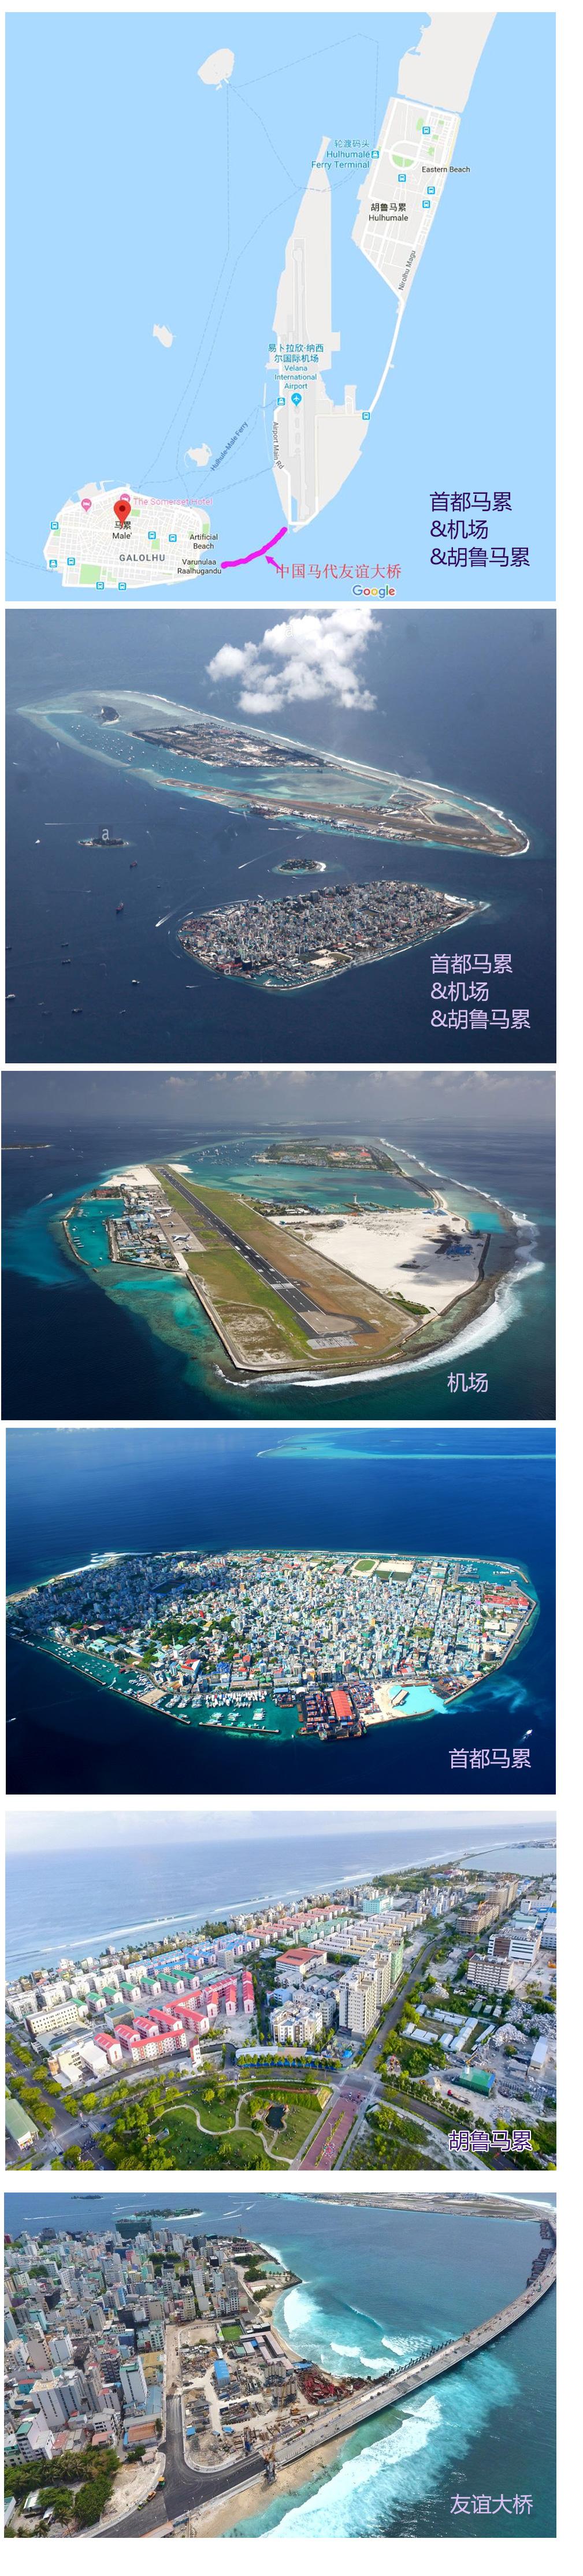 maldives攻略,  马尔代夫地图&环礁气候分布图 -百科-马尔代夫-专业代理-海岸线假期-唯一官方网站